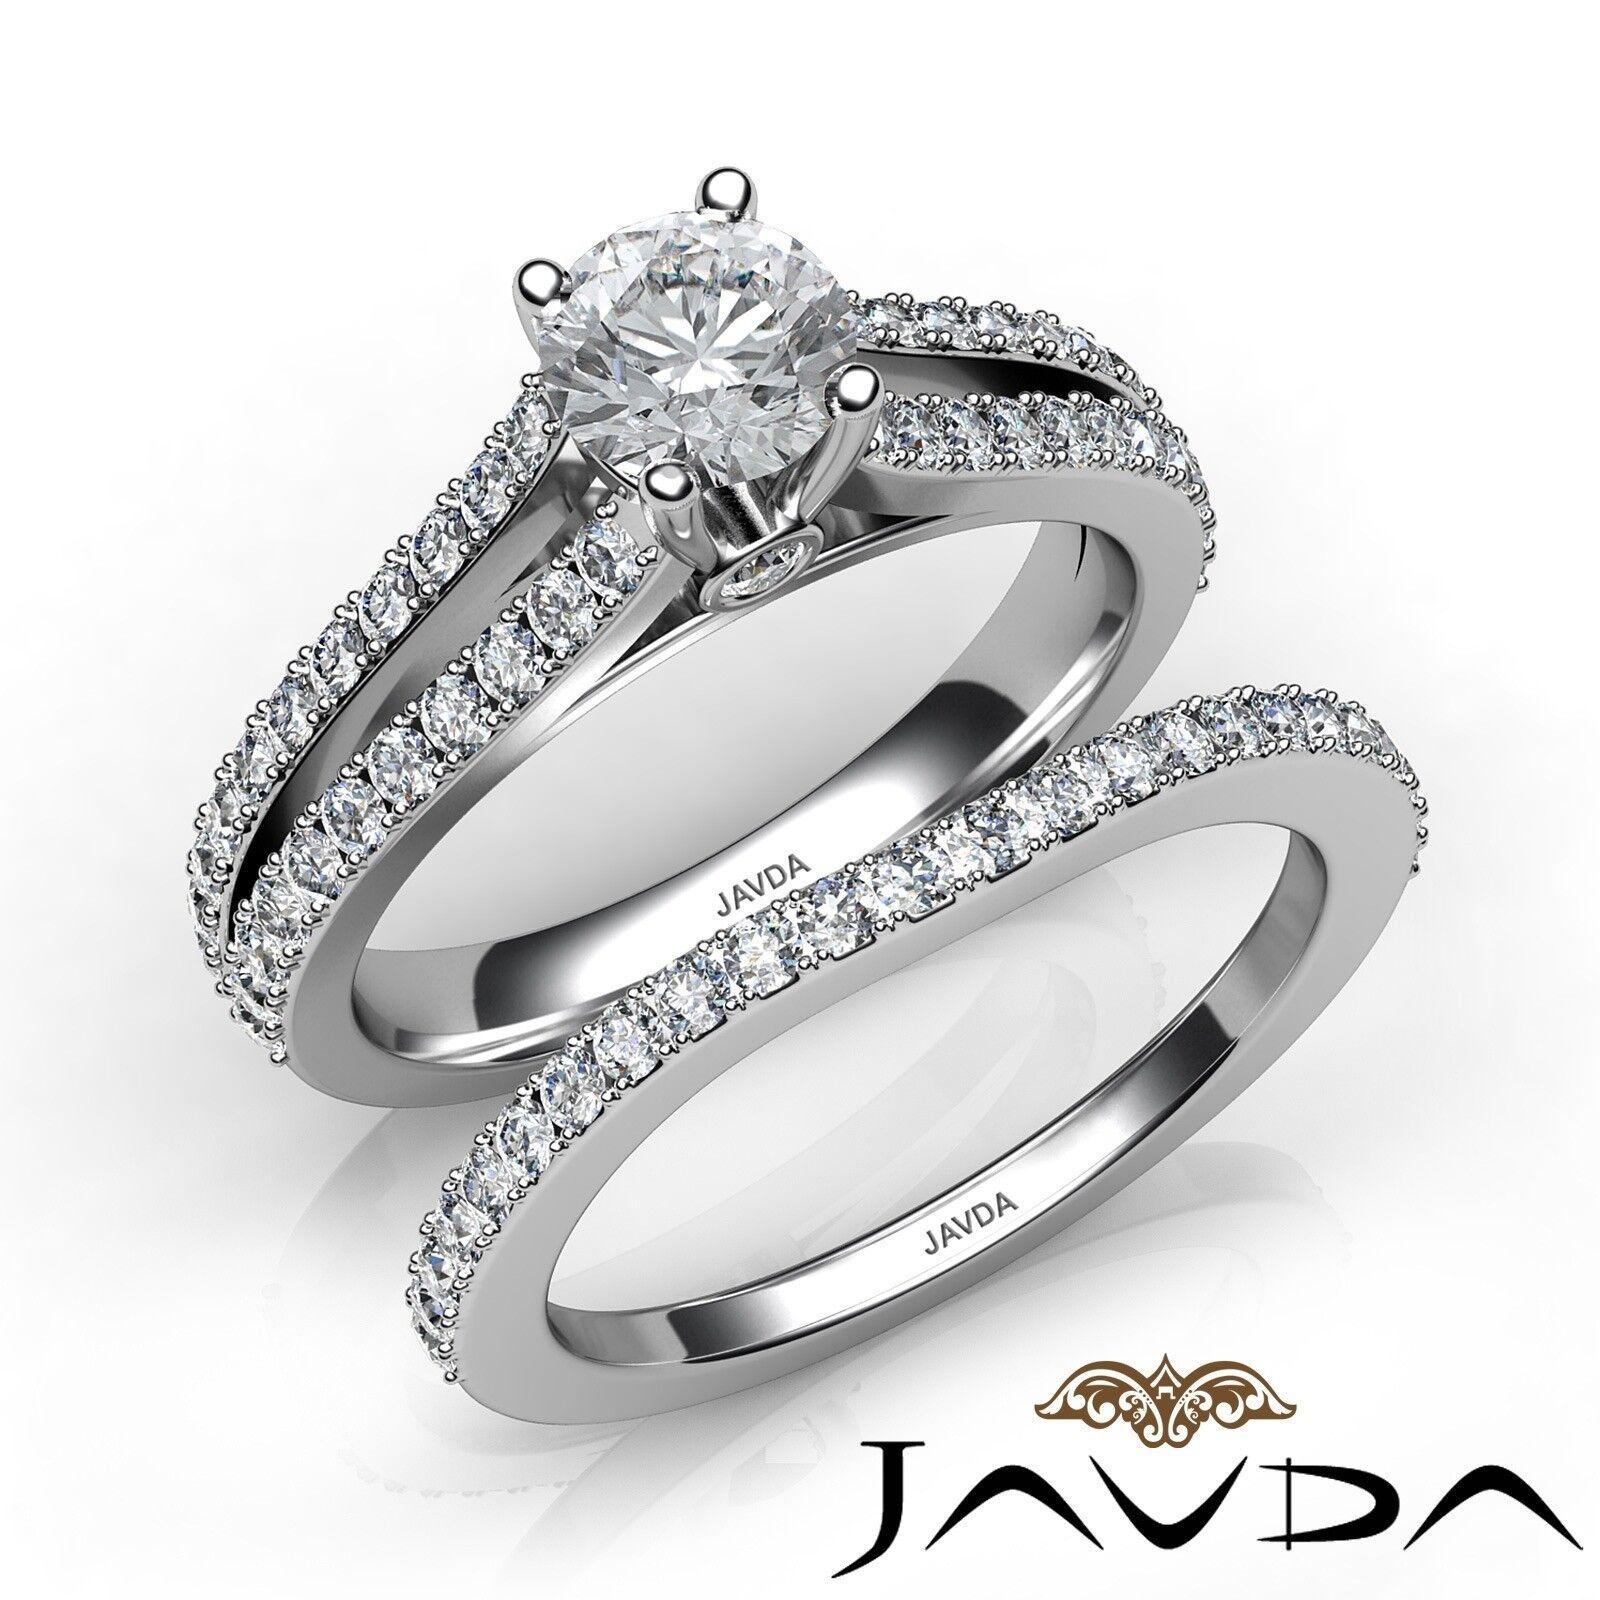 1.6ctw Peekaboo Wedding Bridal Round Diamond Engagement Ring GIA F-VVS2 W Gold